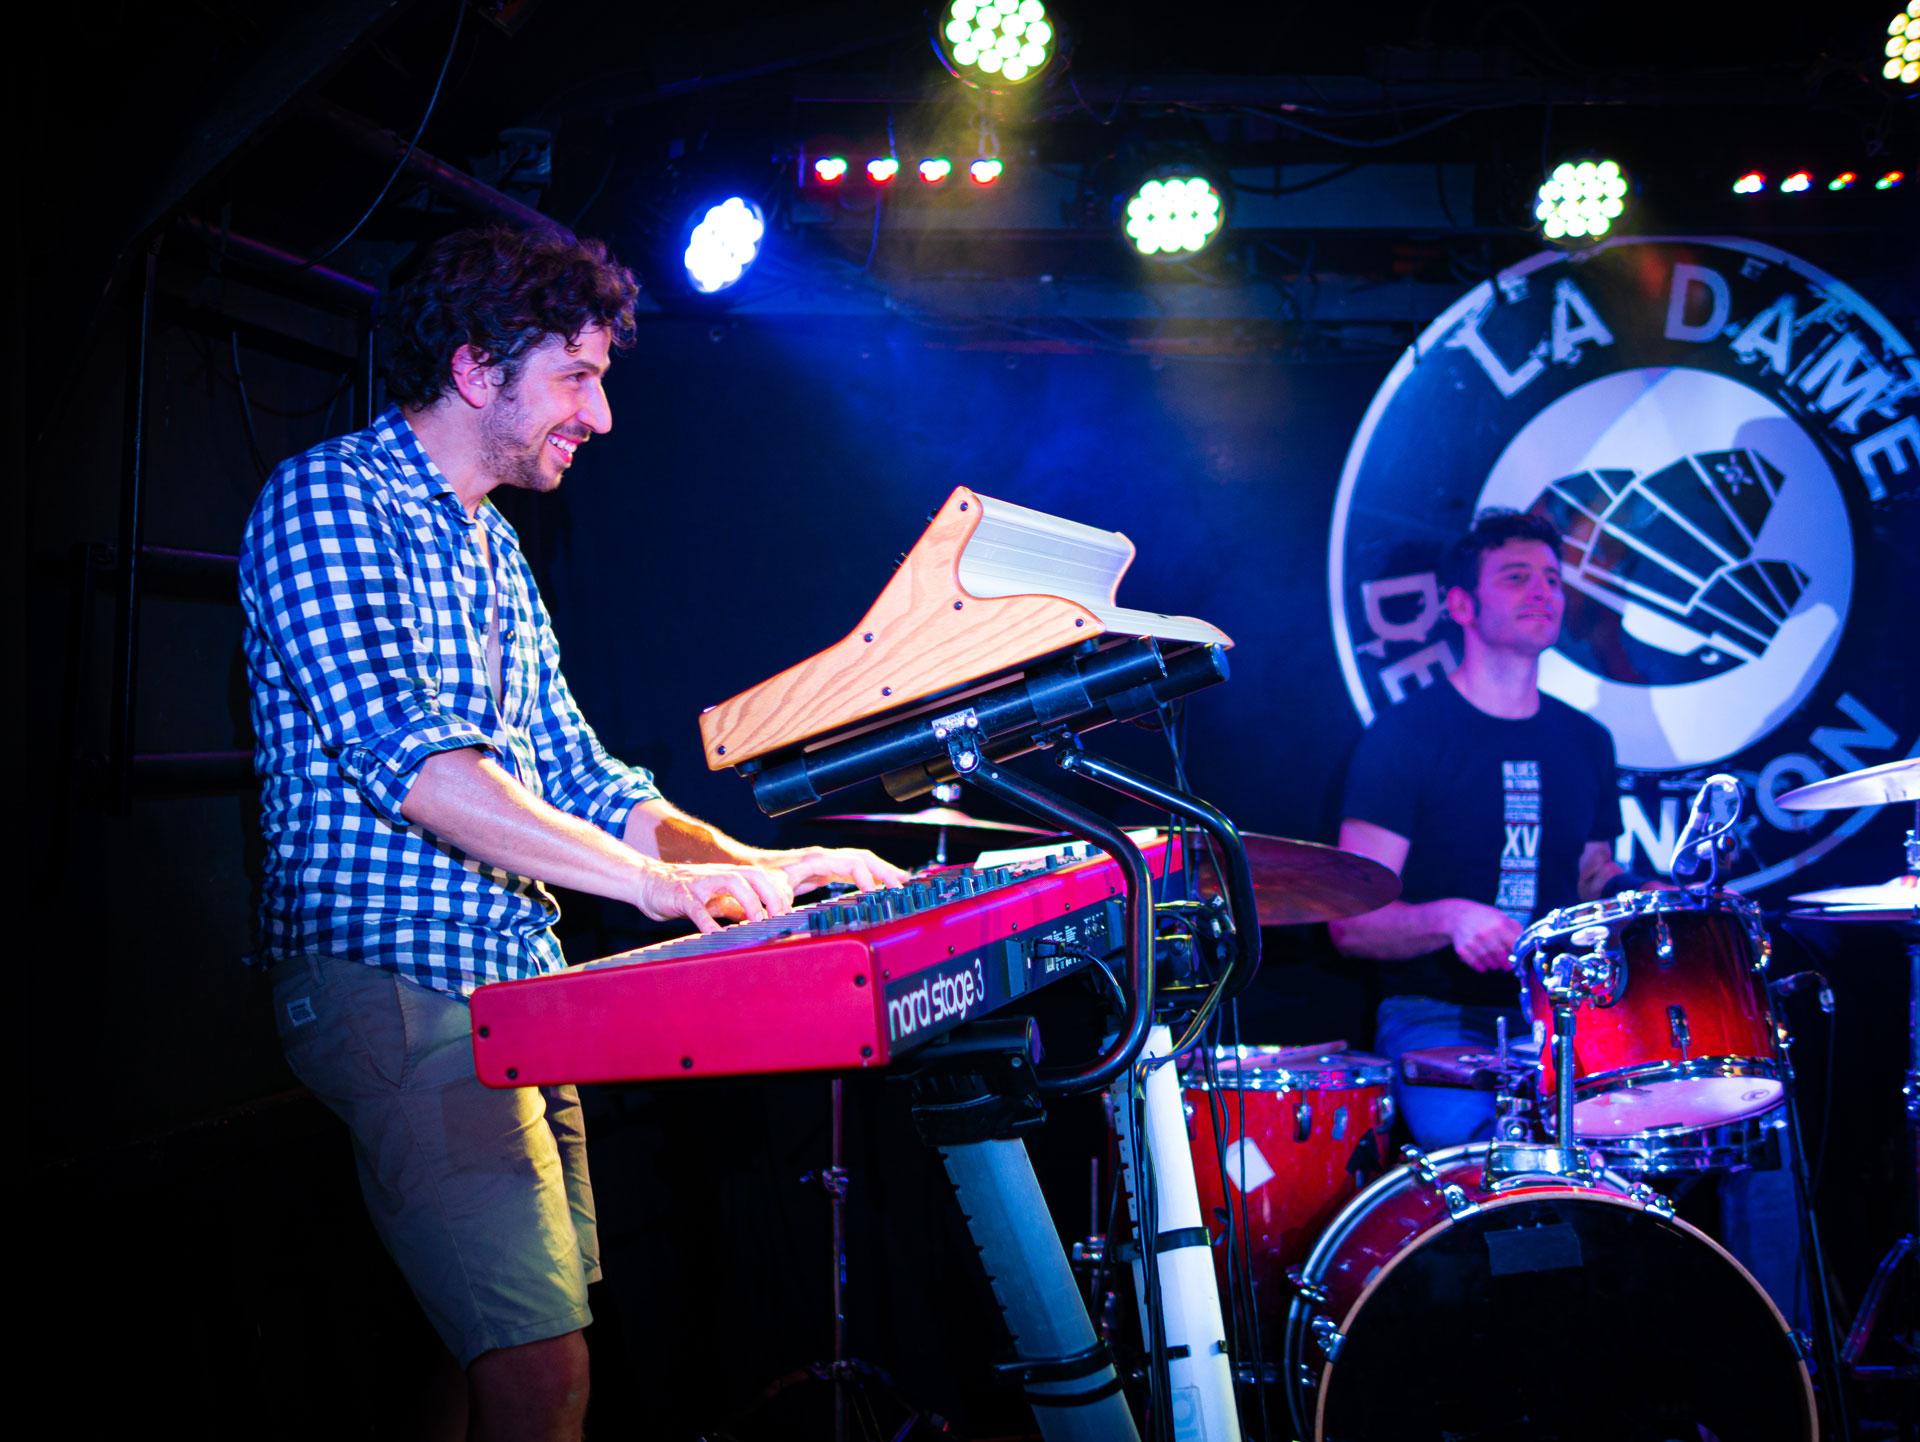 Jazz Rock Progressif - 4dB - Thomas Cassis - Francesco Marzetti